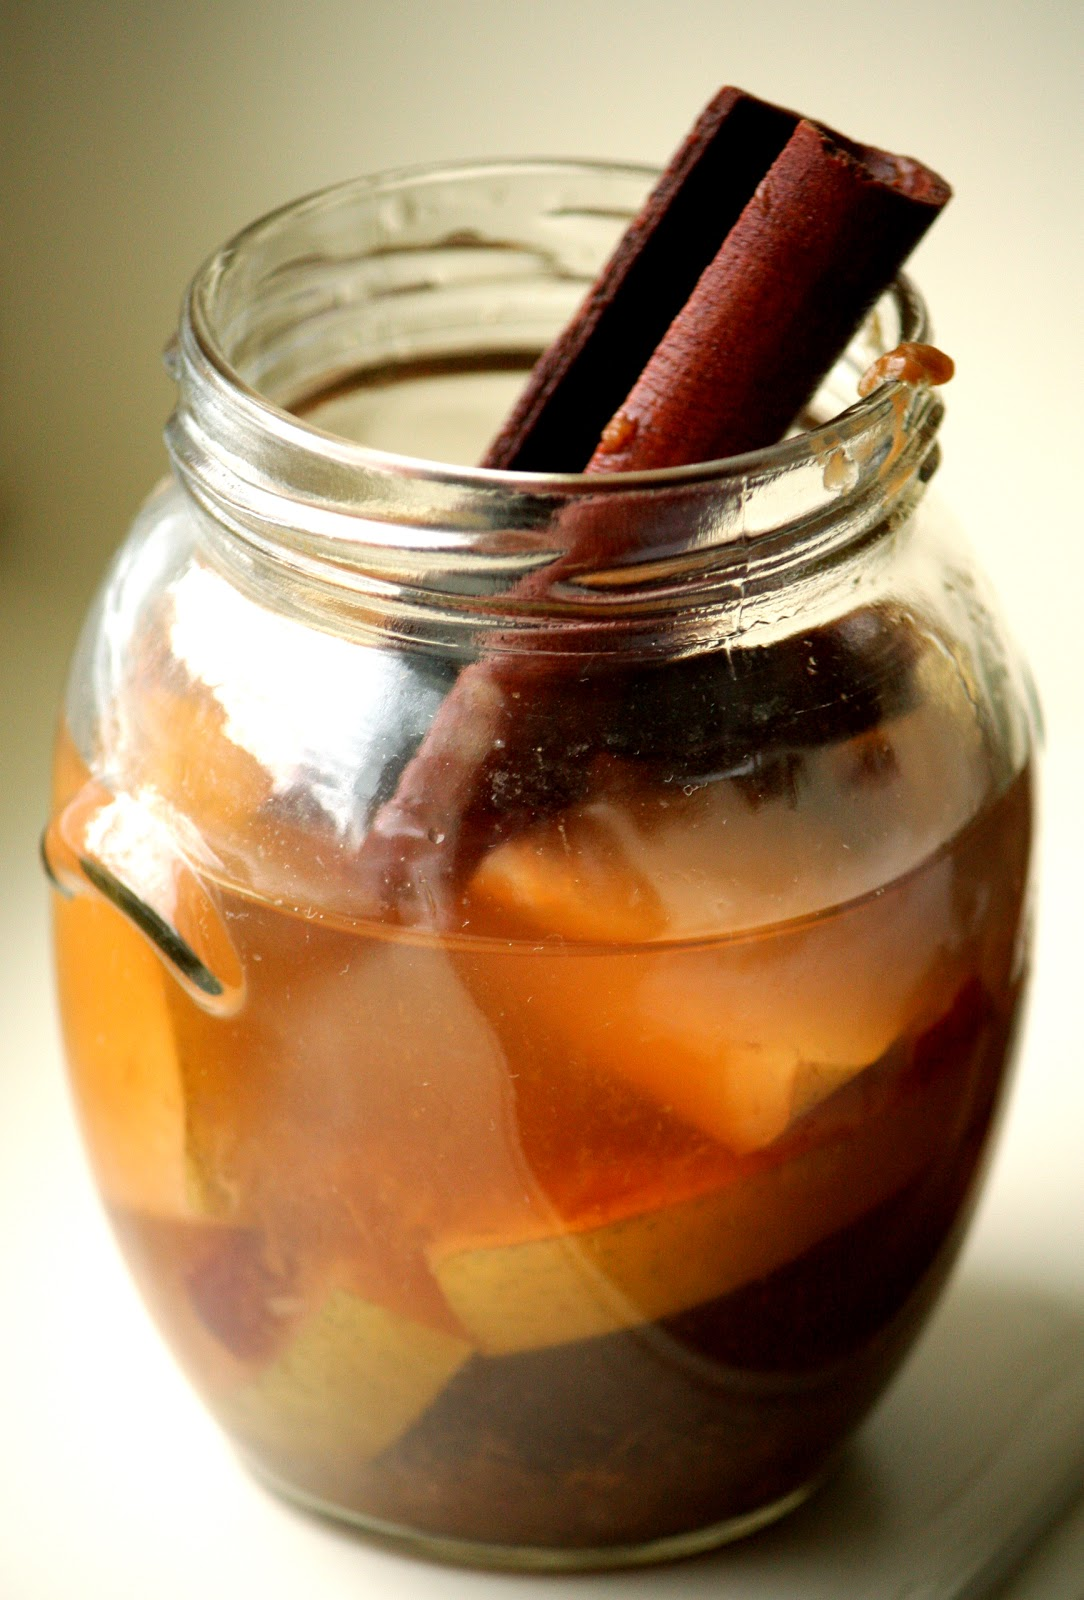 Dolce Fooda: Kompot, A Popular Winter Drink